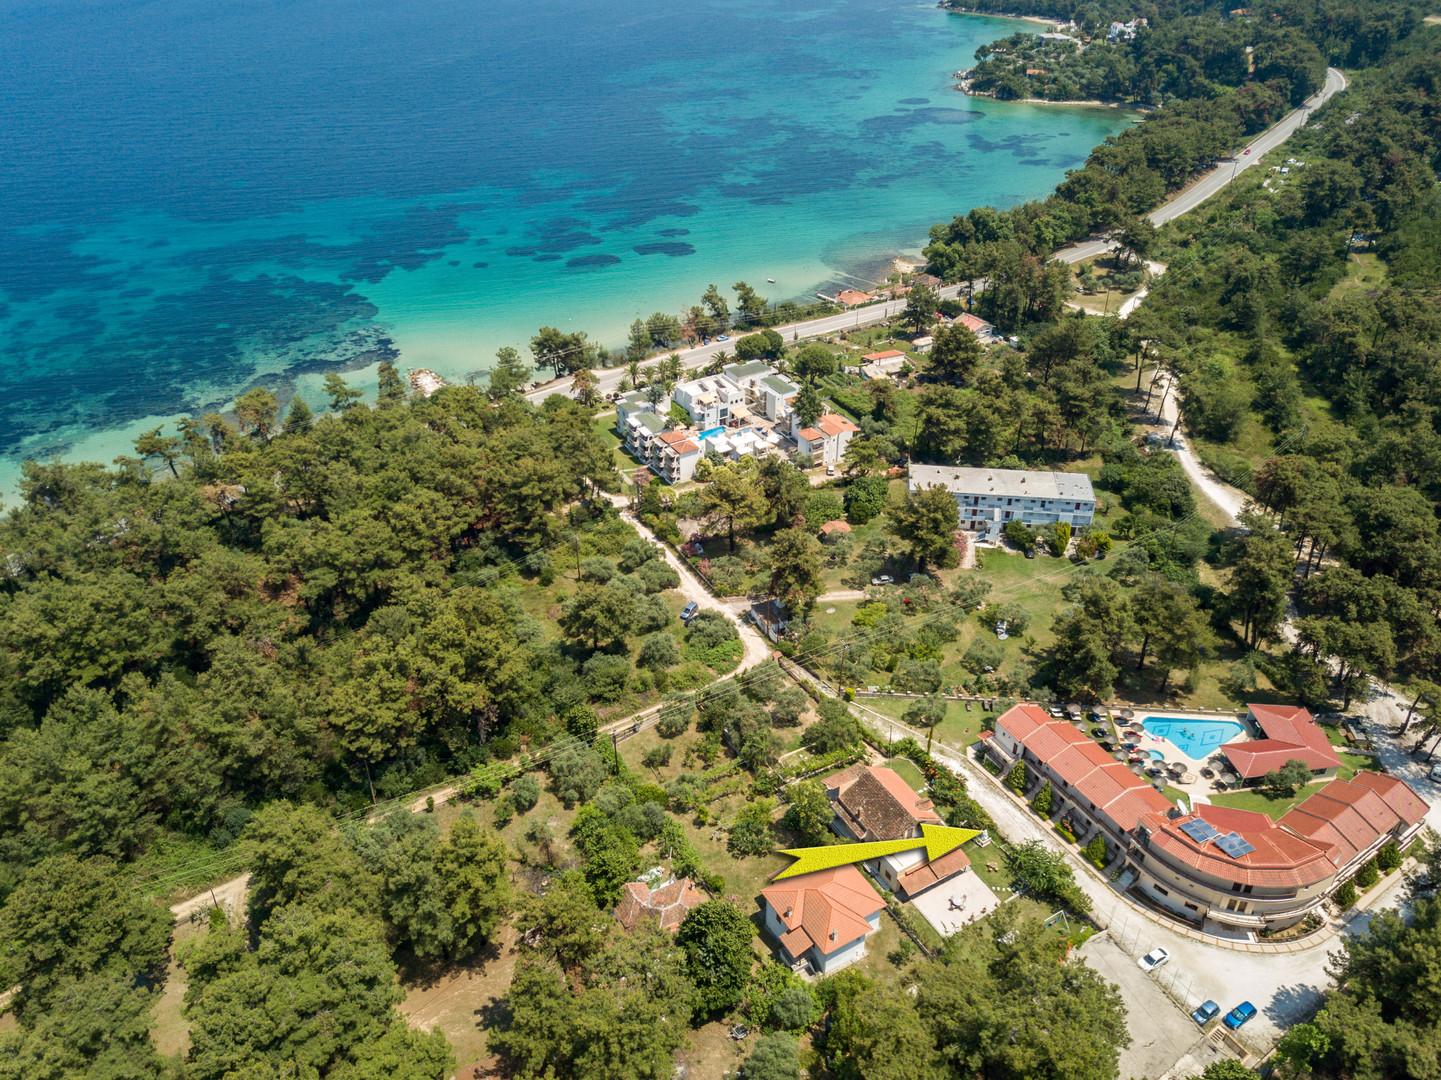 Hotel Four Seasons #2